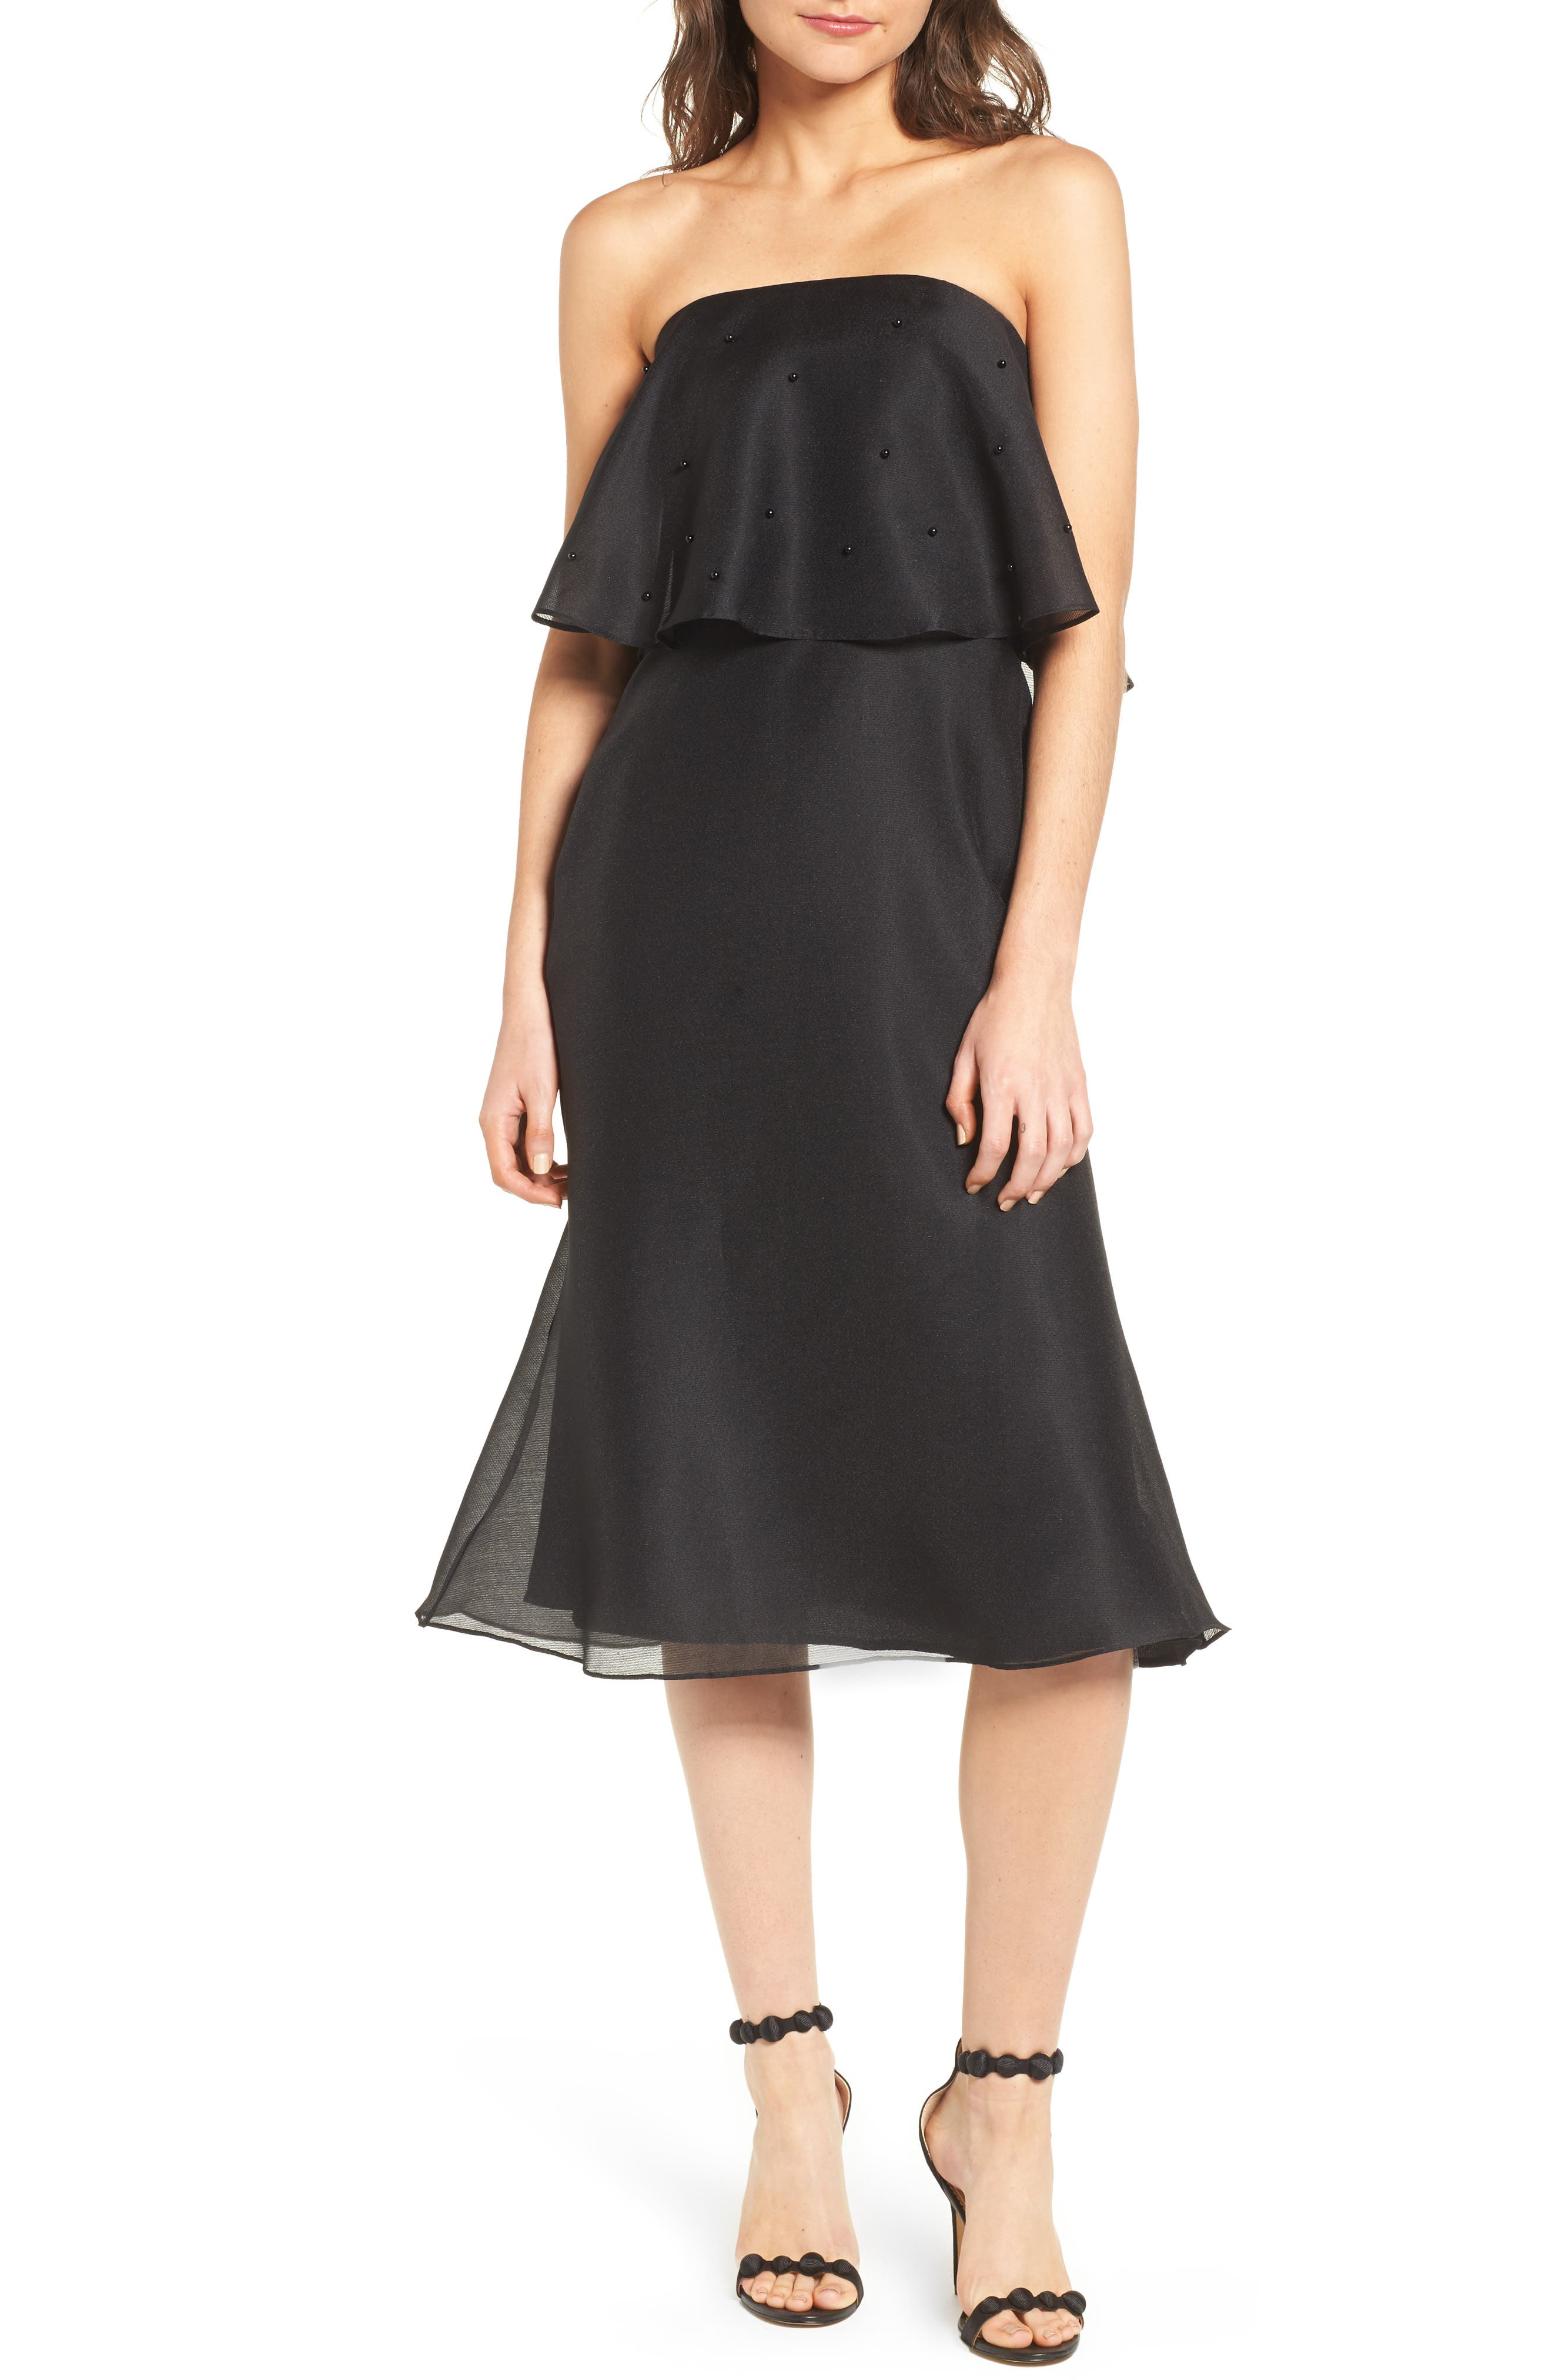 Call Me Strapless Dress,                         Main,                         color, Black